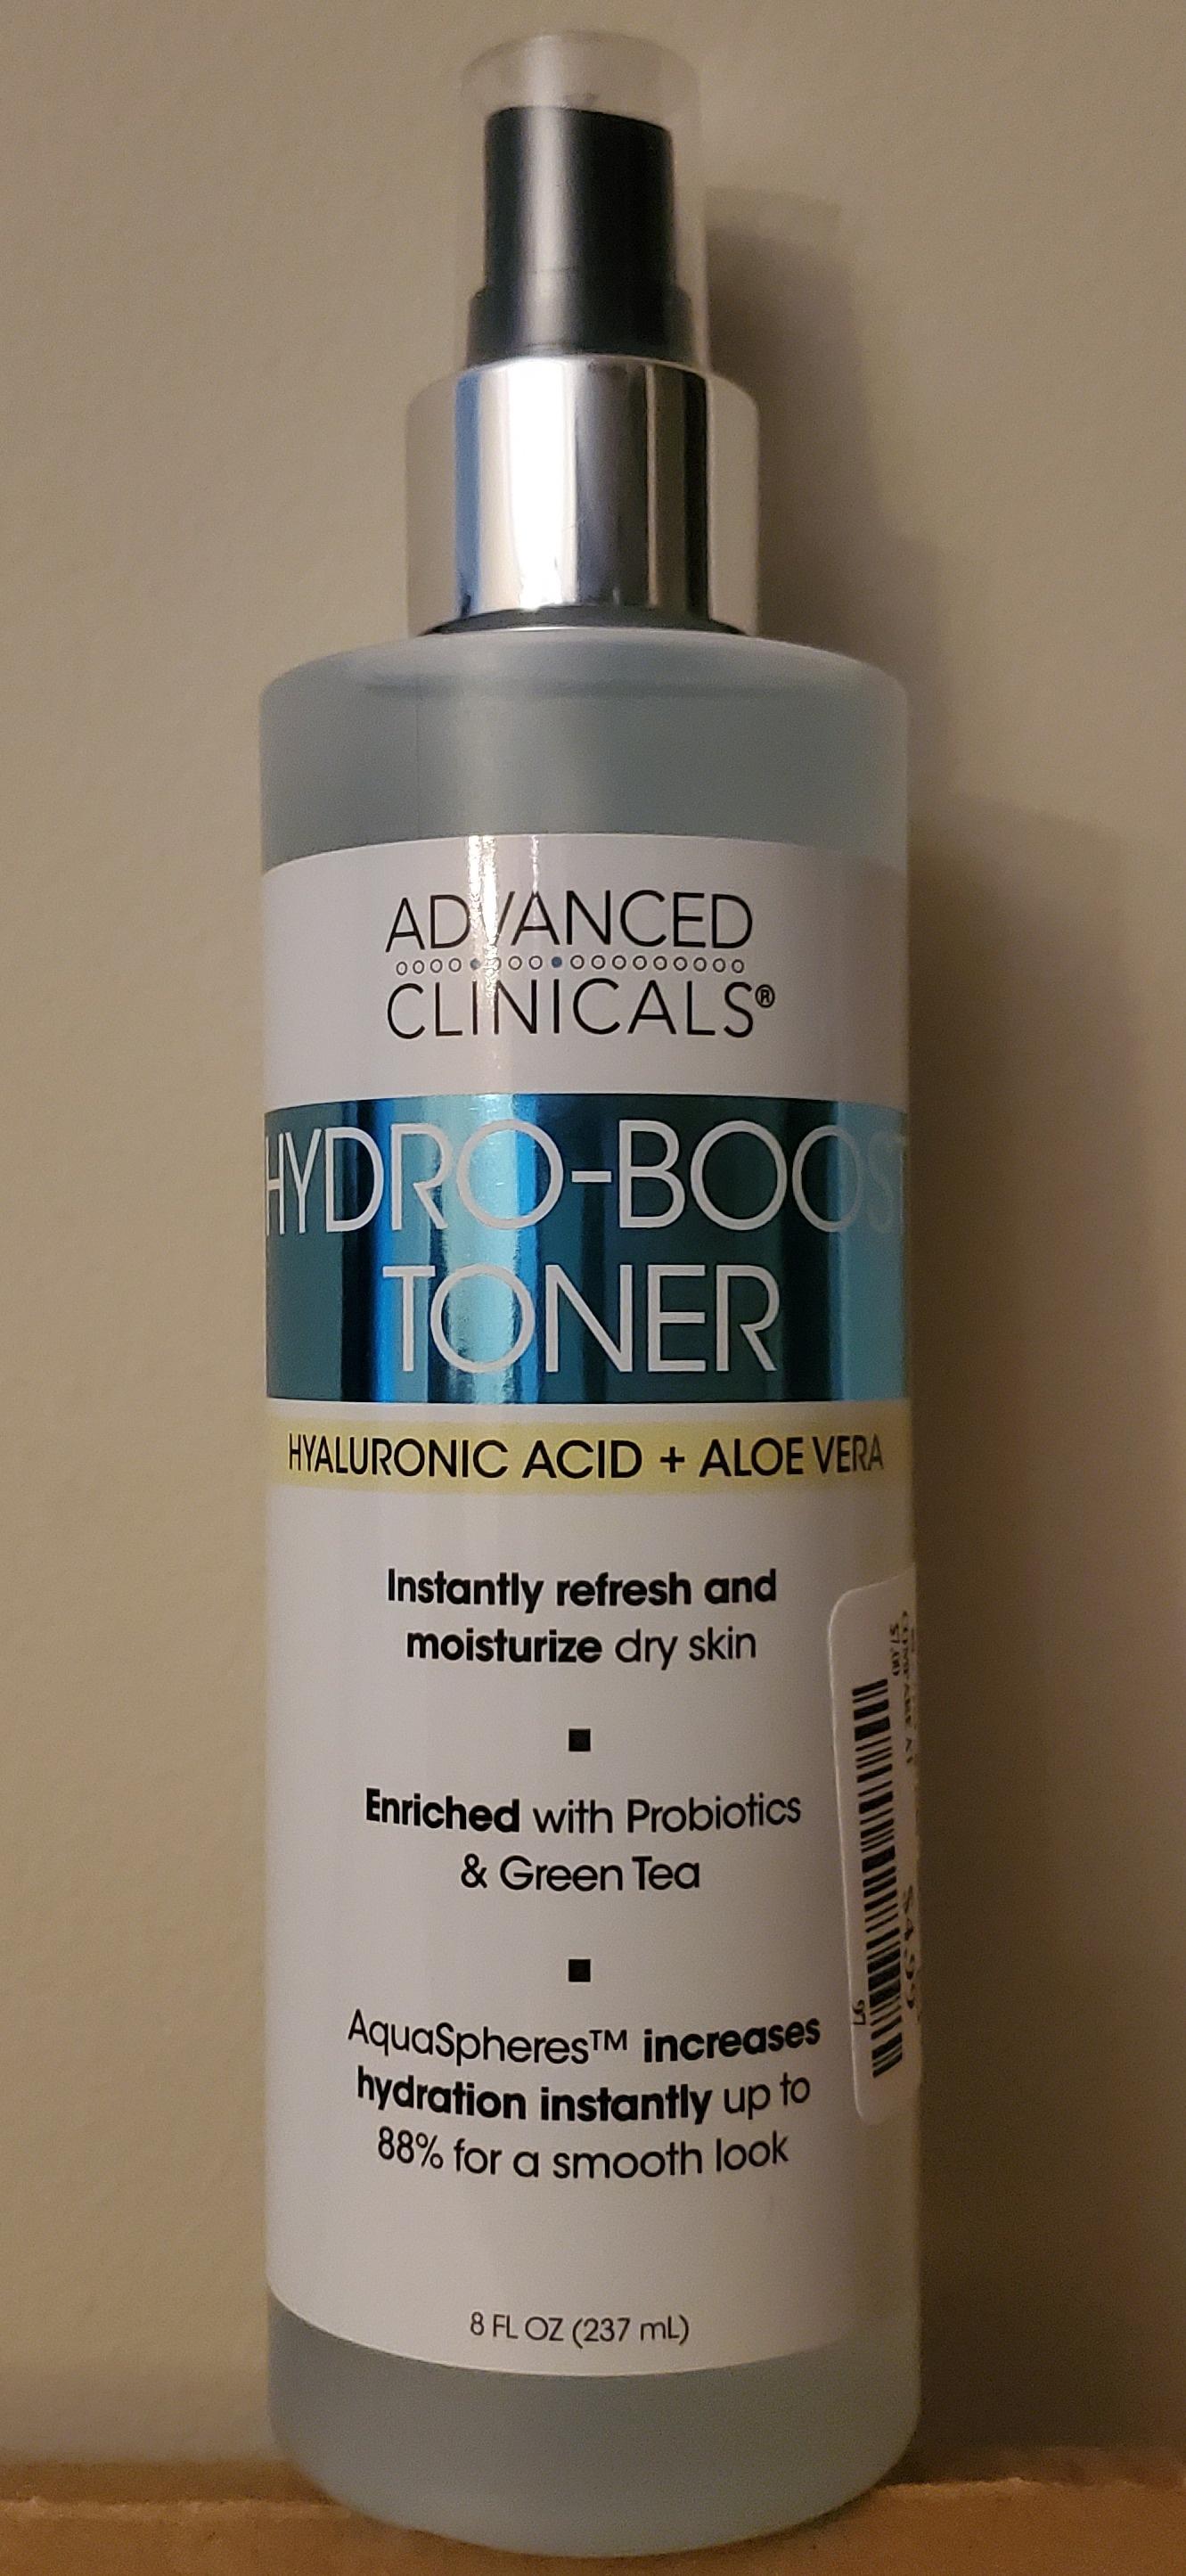 Advanced Clinicals Hydro-Boost Toner